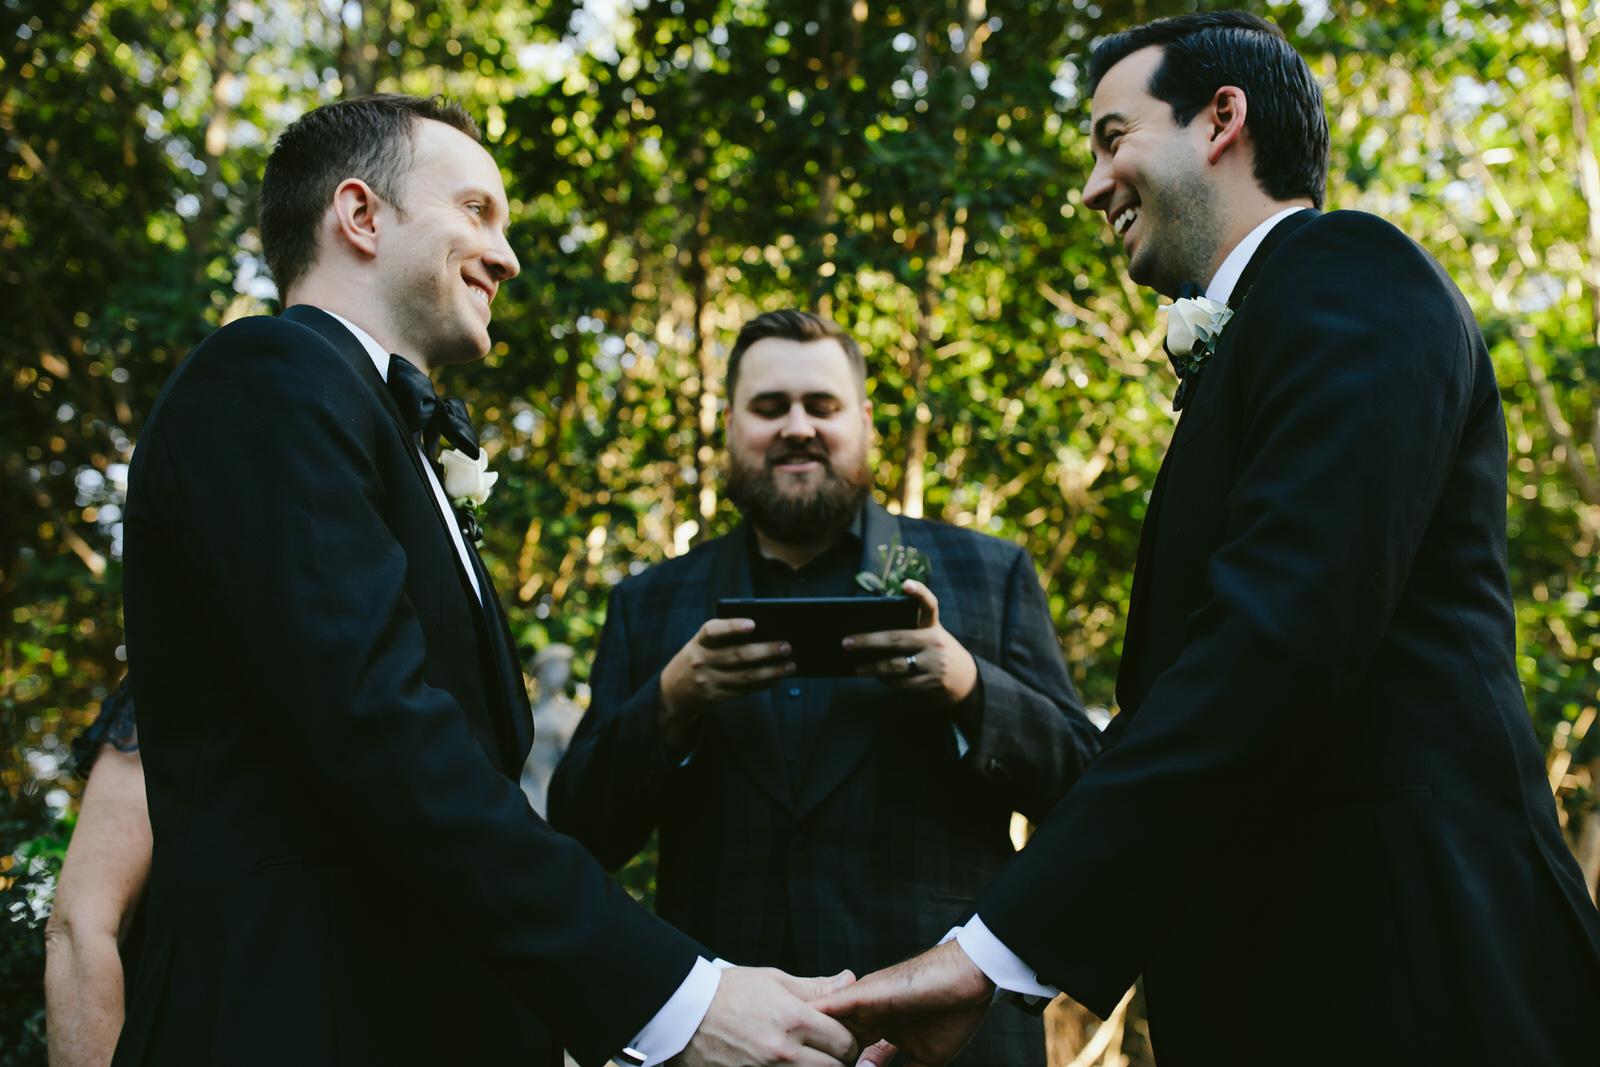 vizcaya_elopement_intimate_wedding_ceremony-17.jpg